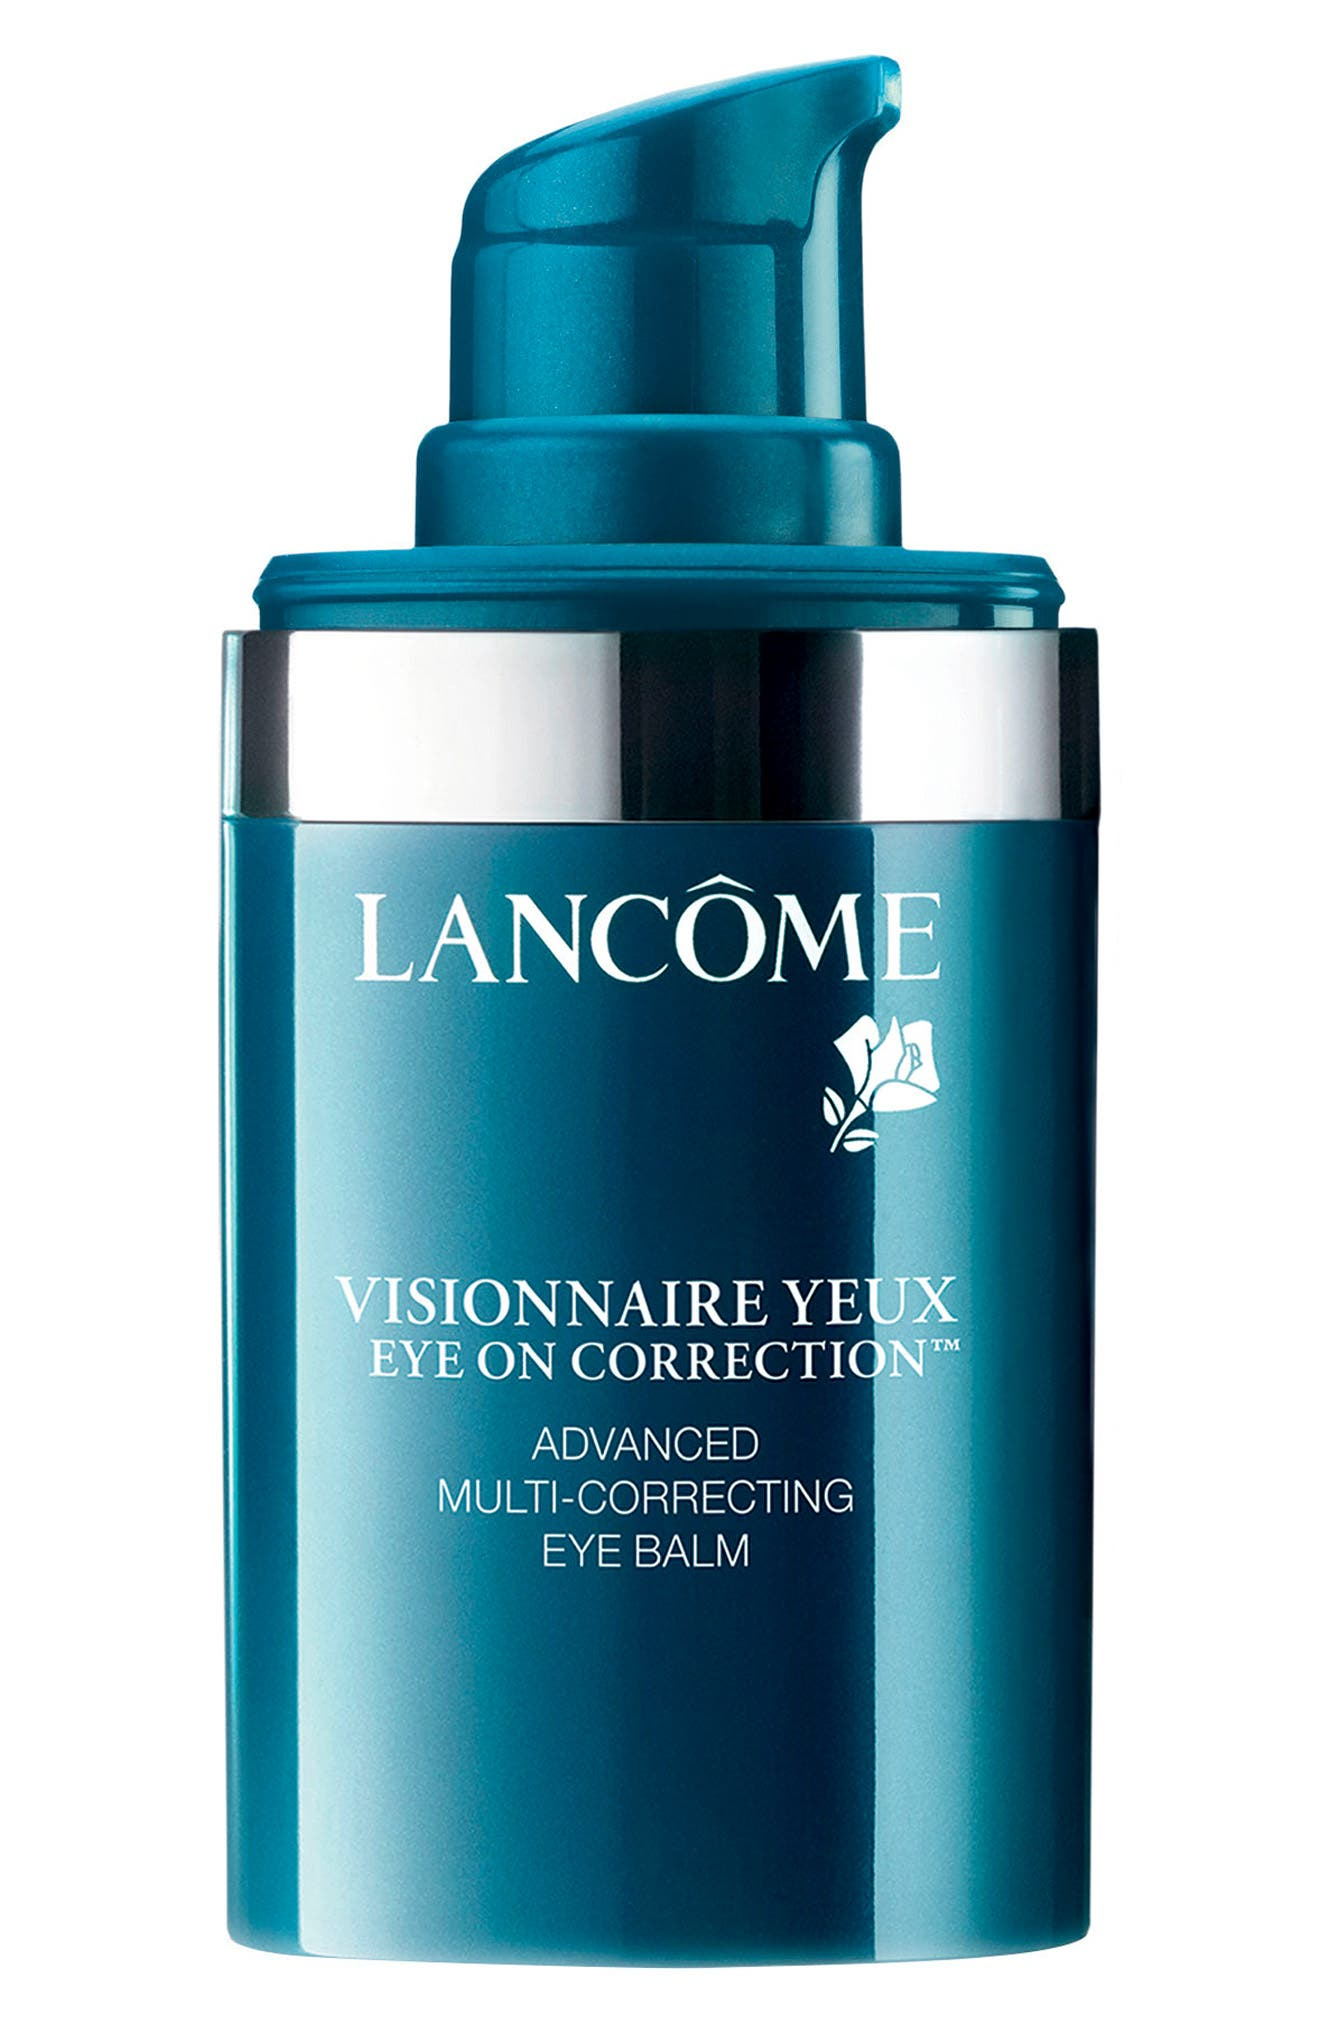 LANCÔME, Visionnaire Yeux Eye on Correction<sup>®</sup> Advanced Multi-Correcting Eye Balm, Main thumbnail 1, color, NO COLOR